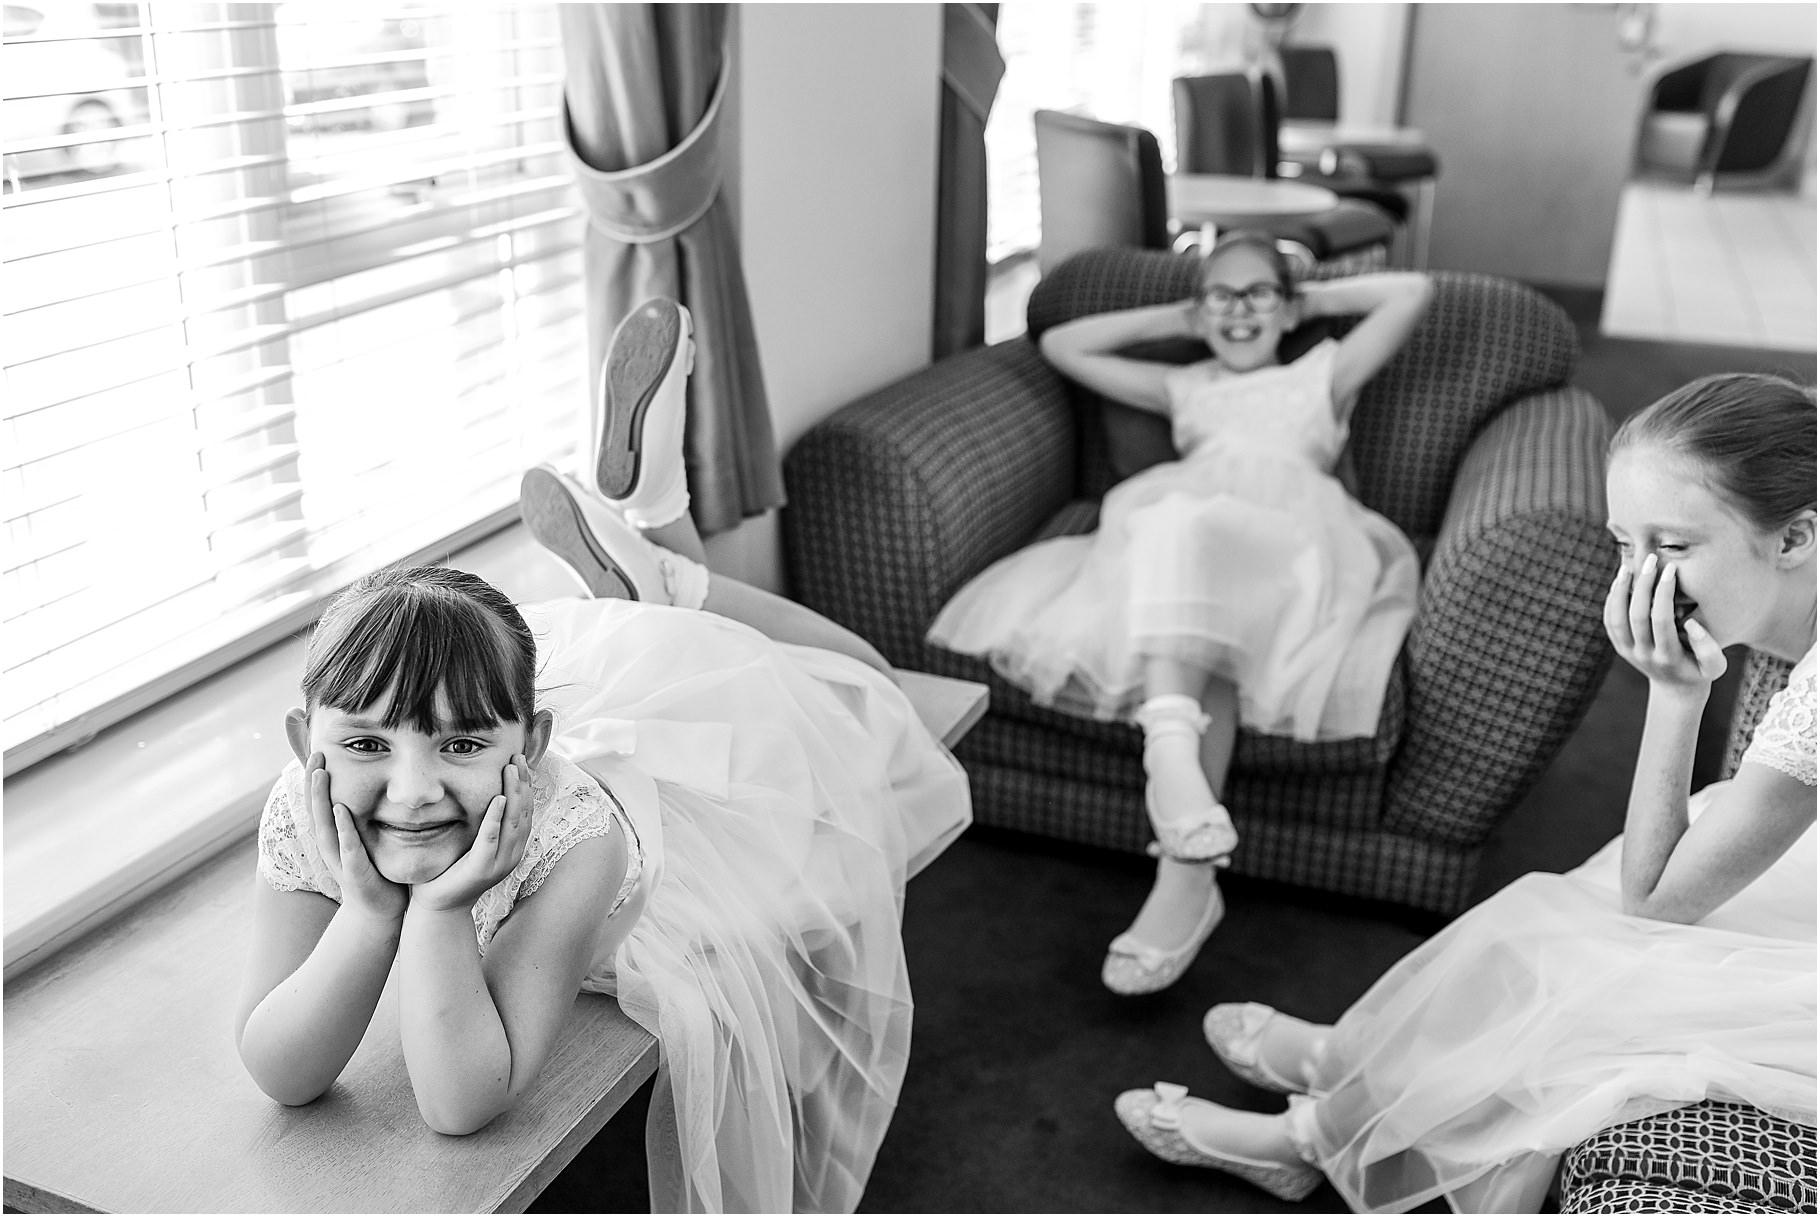 dan-wootton-photography-2017-weddings-043.jpg